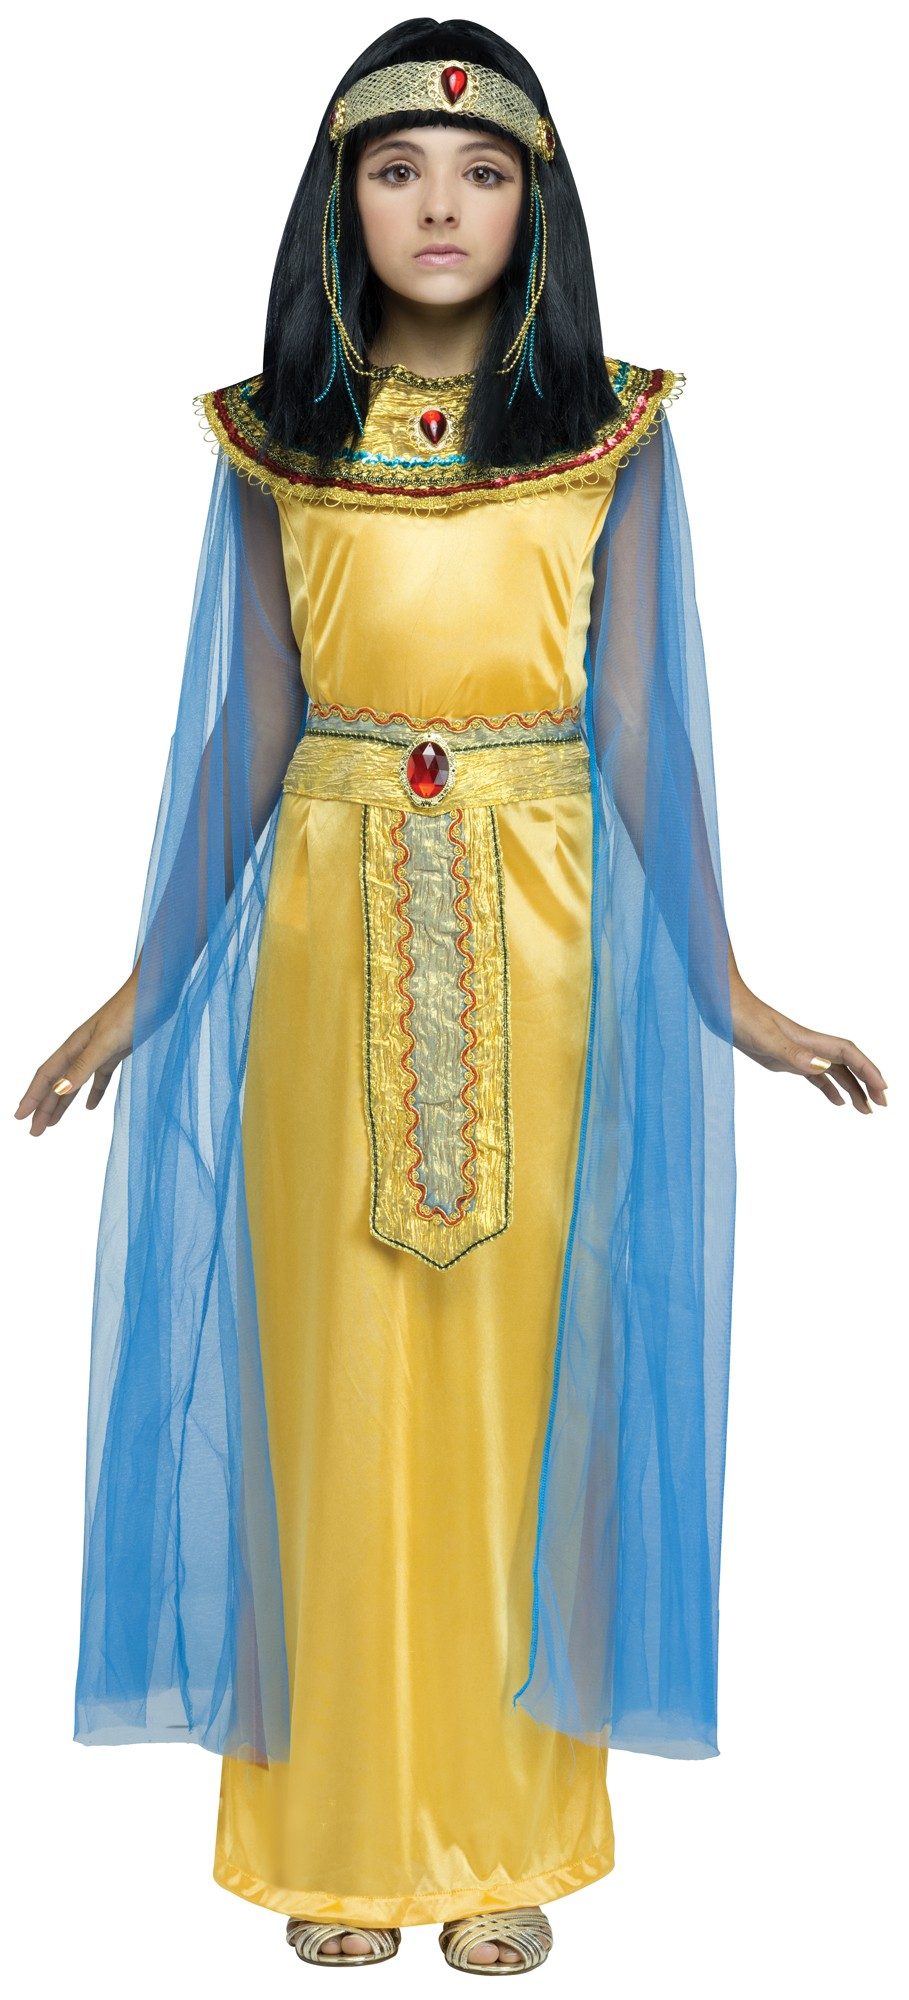 Goldren Cleopatra Costume  sc 1 st  Mega Fancy Dress & Goldren Cleopatra Costume | Letter